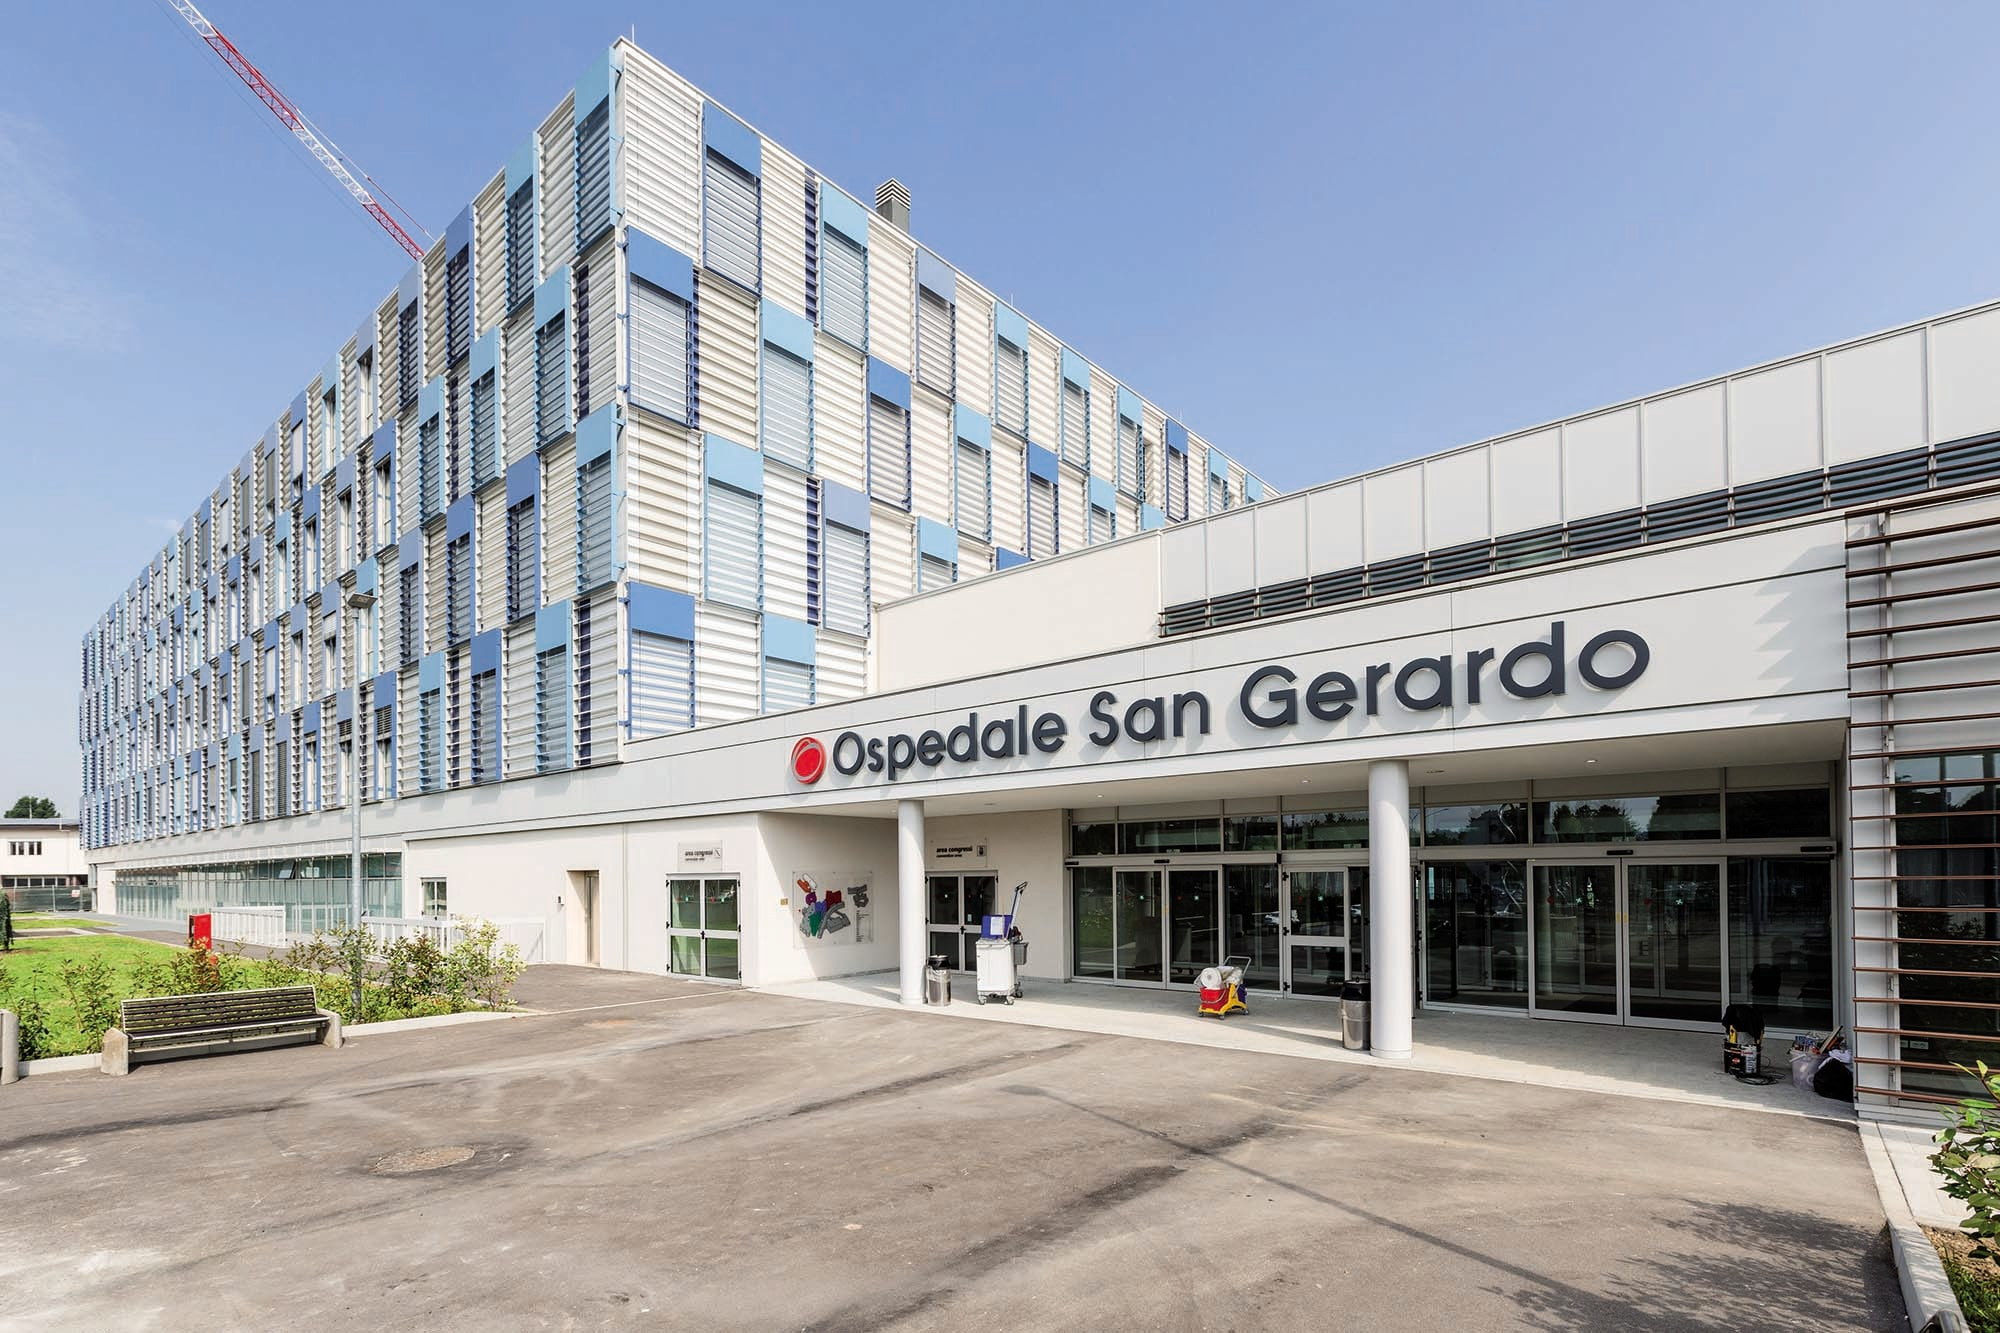 San Gerardo Hospital Monza Italy